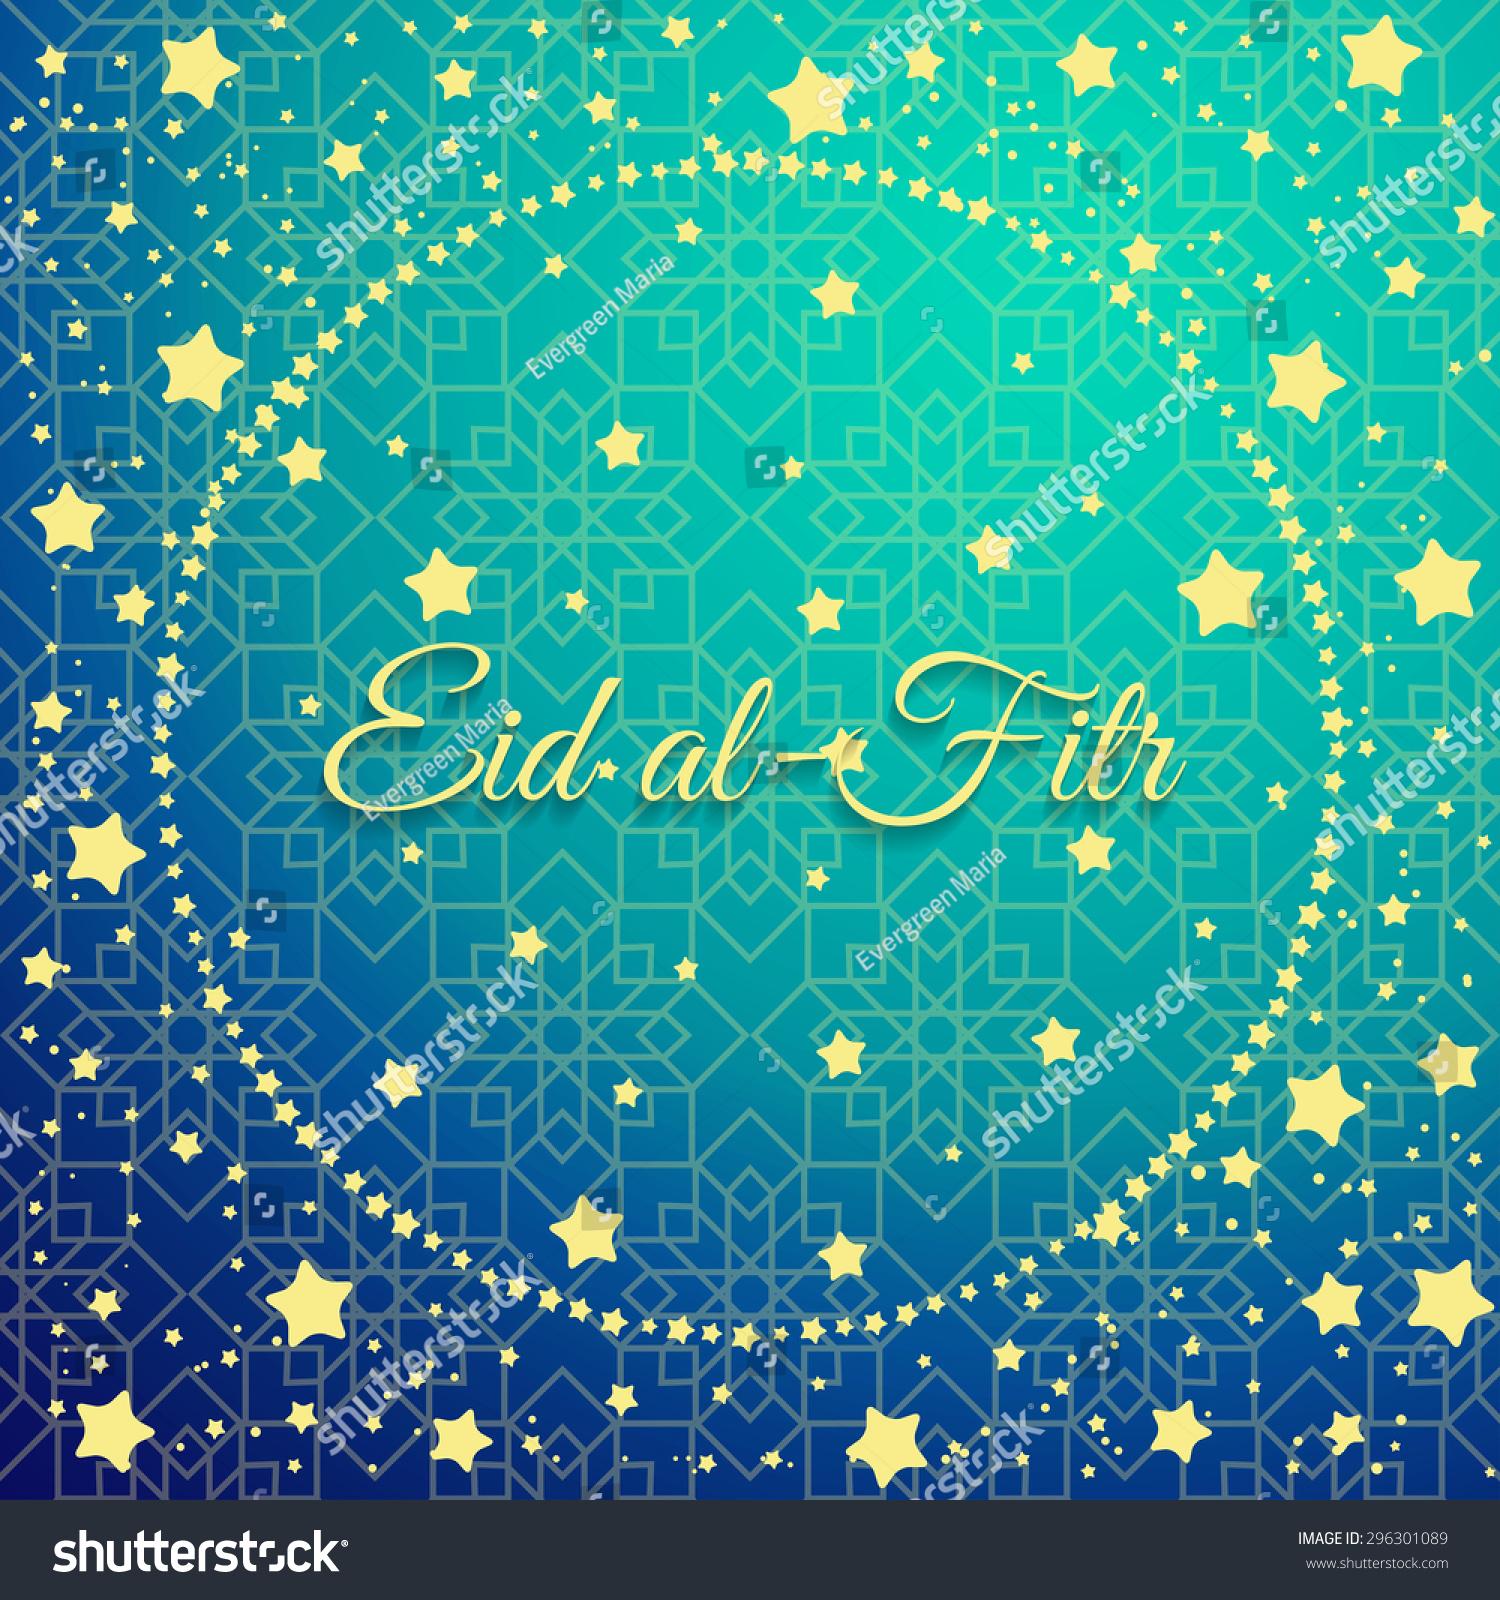 Download Hajj Eid Al-Fitr Decorations - stock-vector-muslim-community-festival-eid-al-fitr-celebration-greeting-card-decorated-with-golden-stars-and-296301089  2018_168362 .jpg